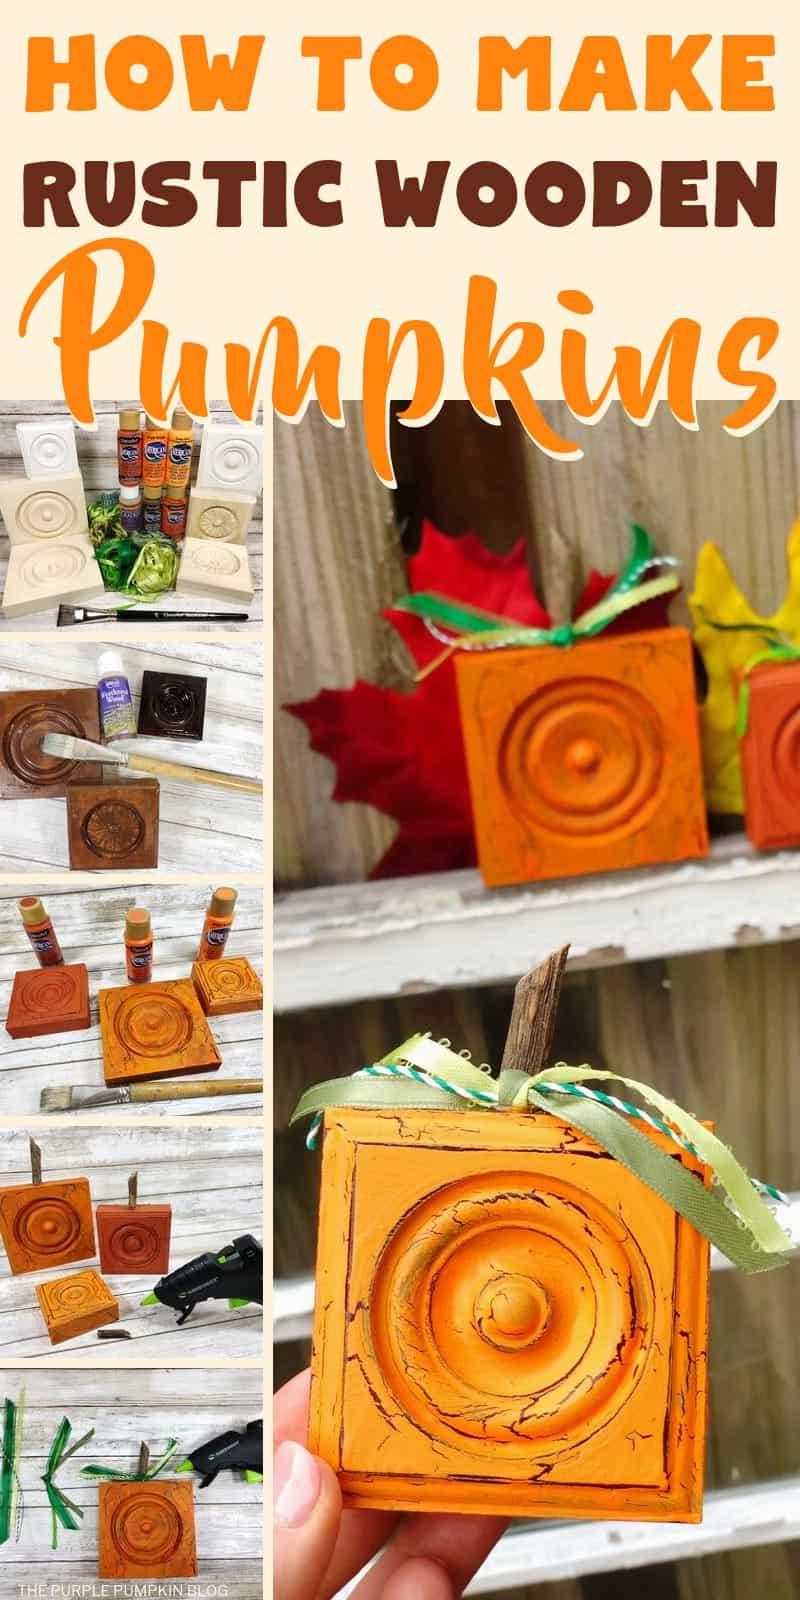 How to make Rustic Wooden Pumpkins